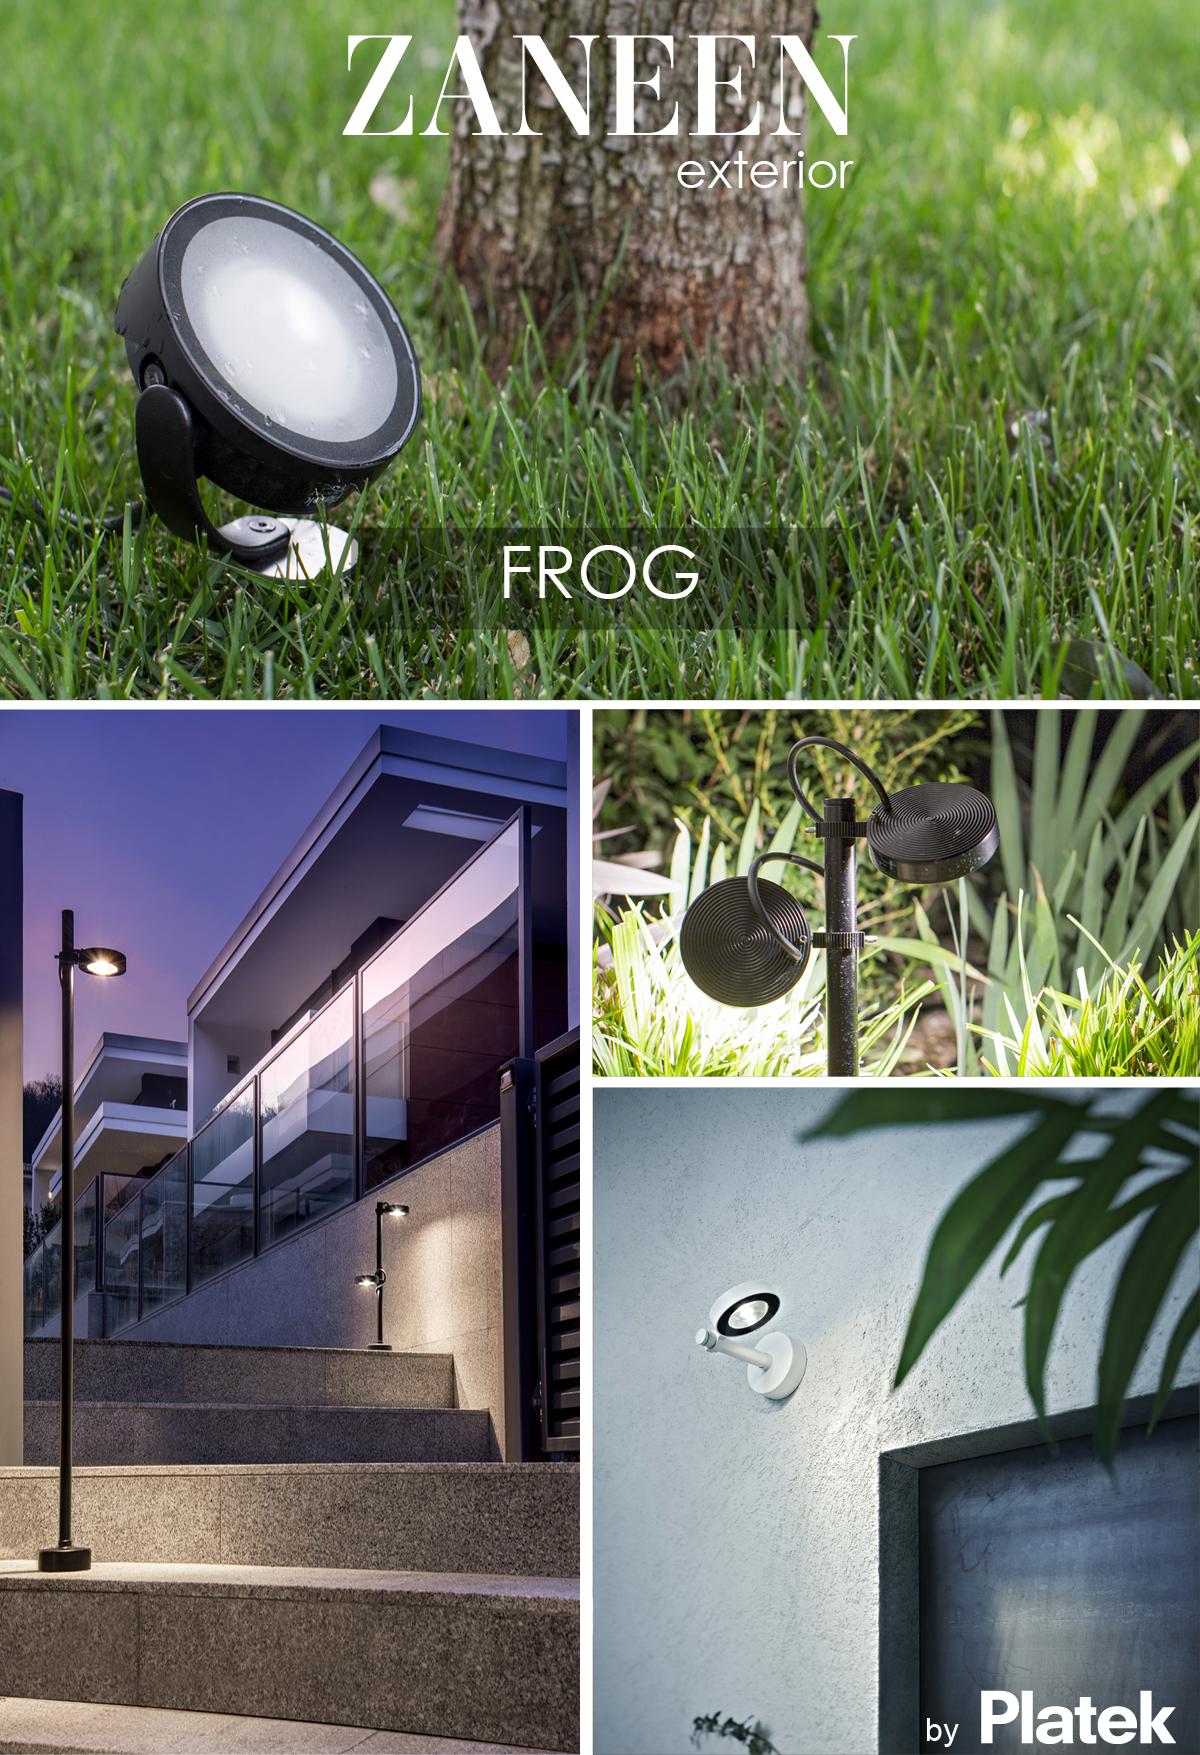 April 16, 2020 Frog